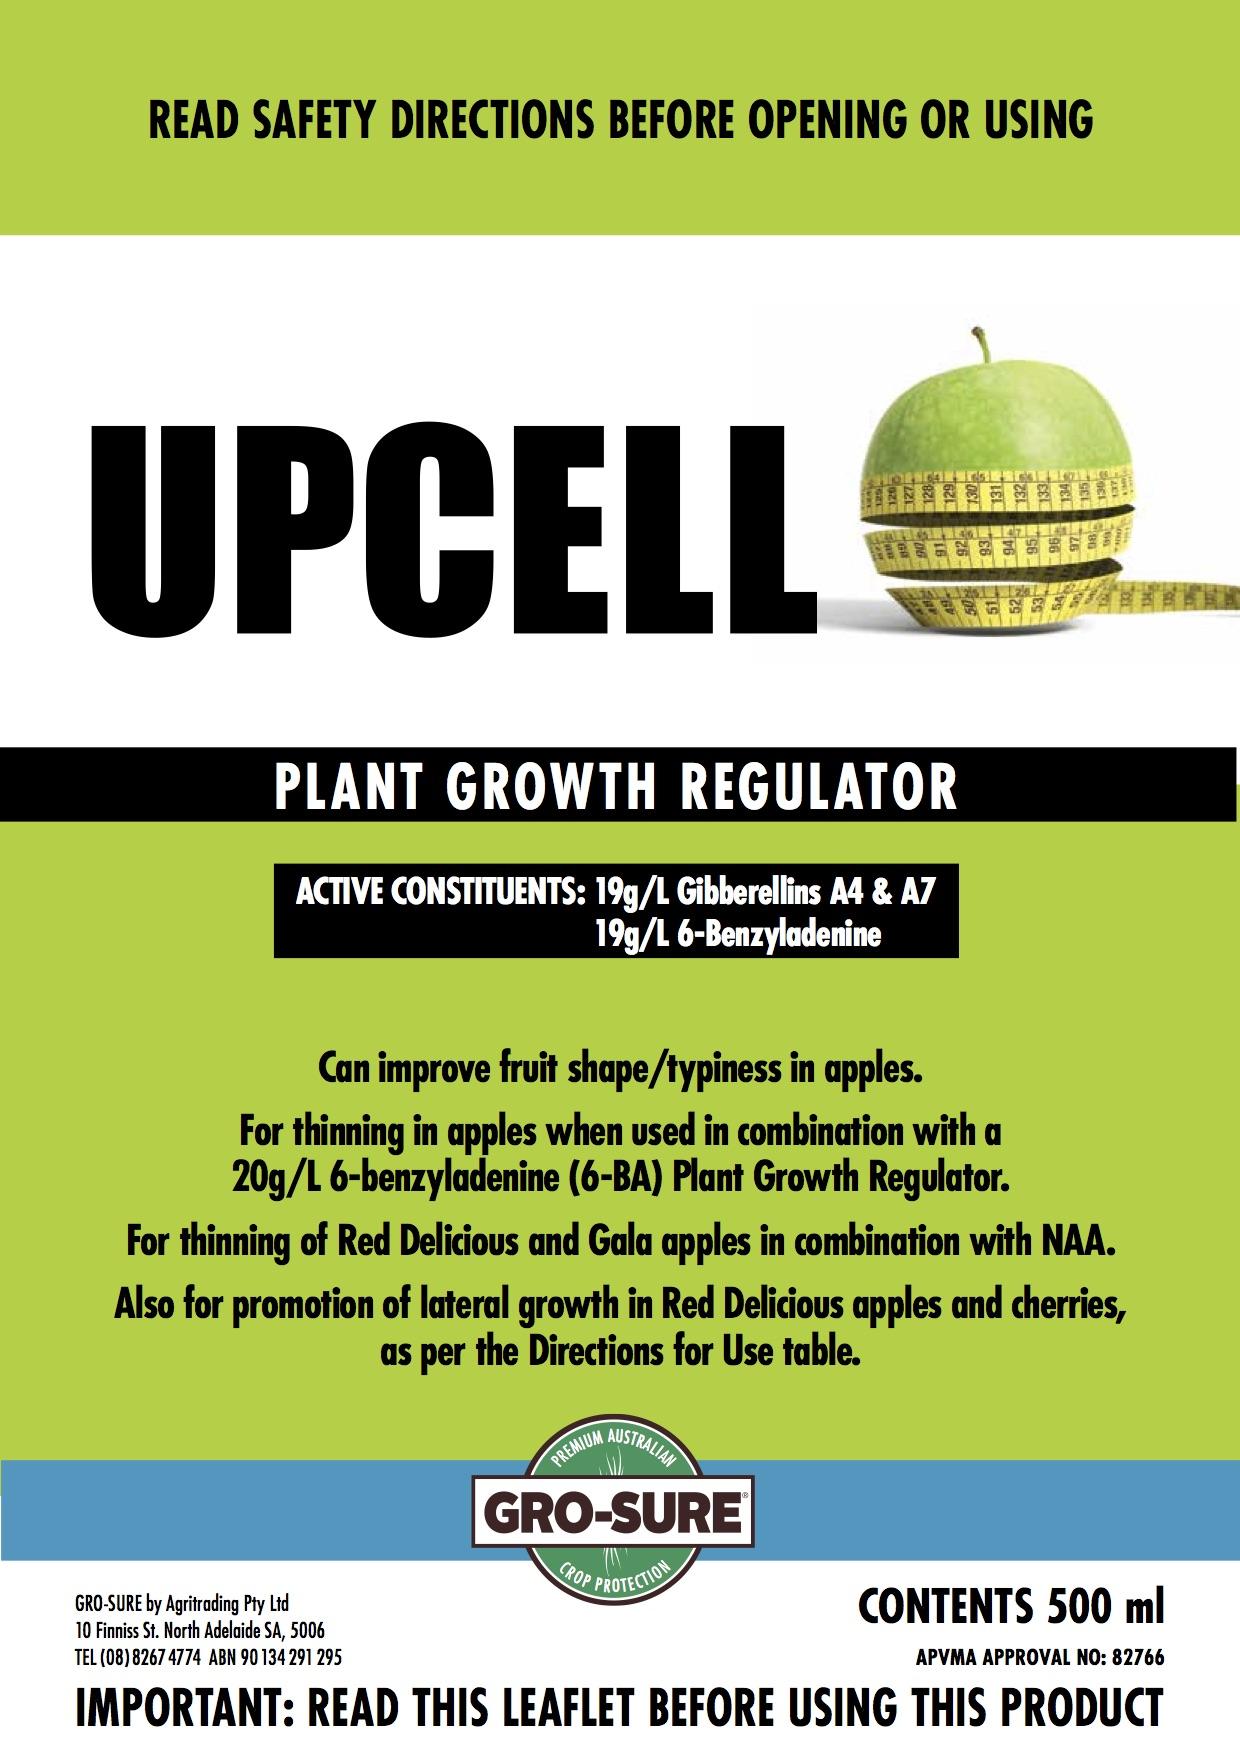 UpCell Web Label copy.jpg